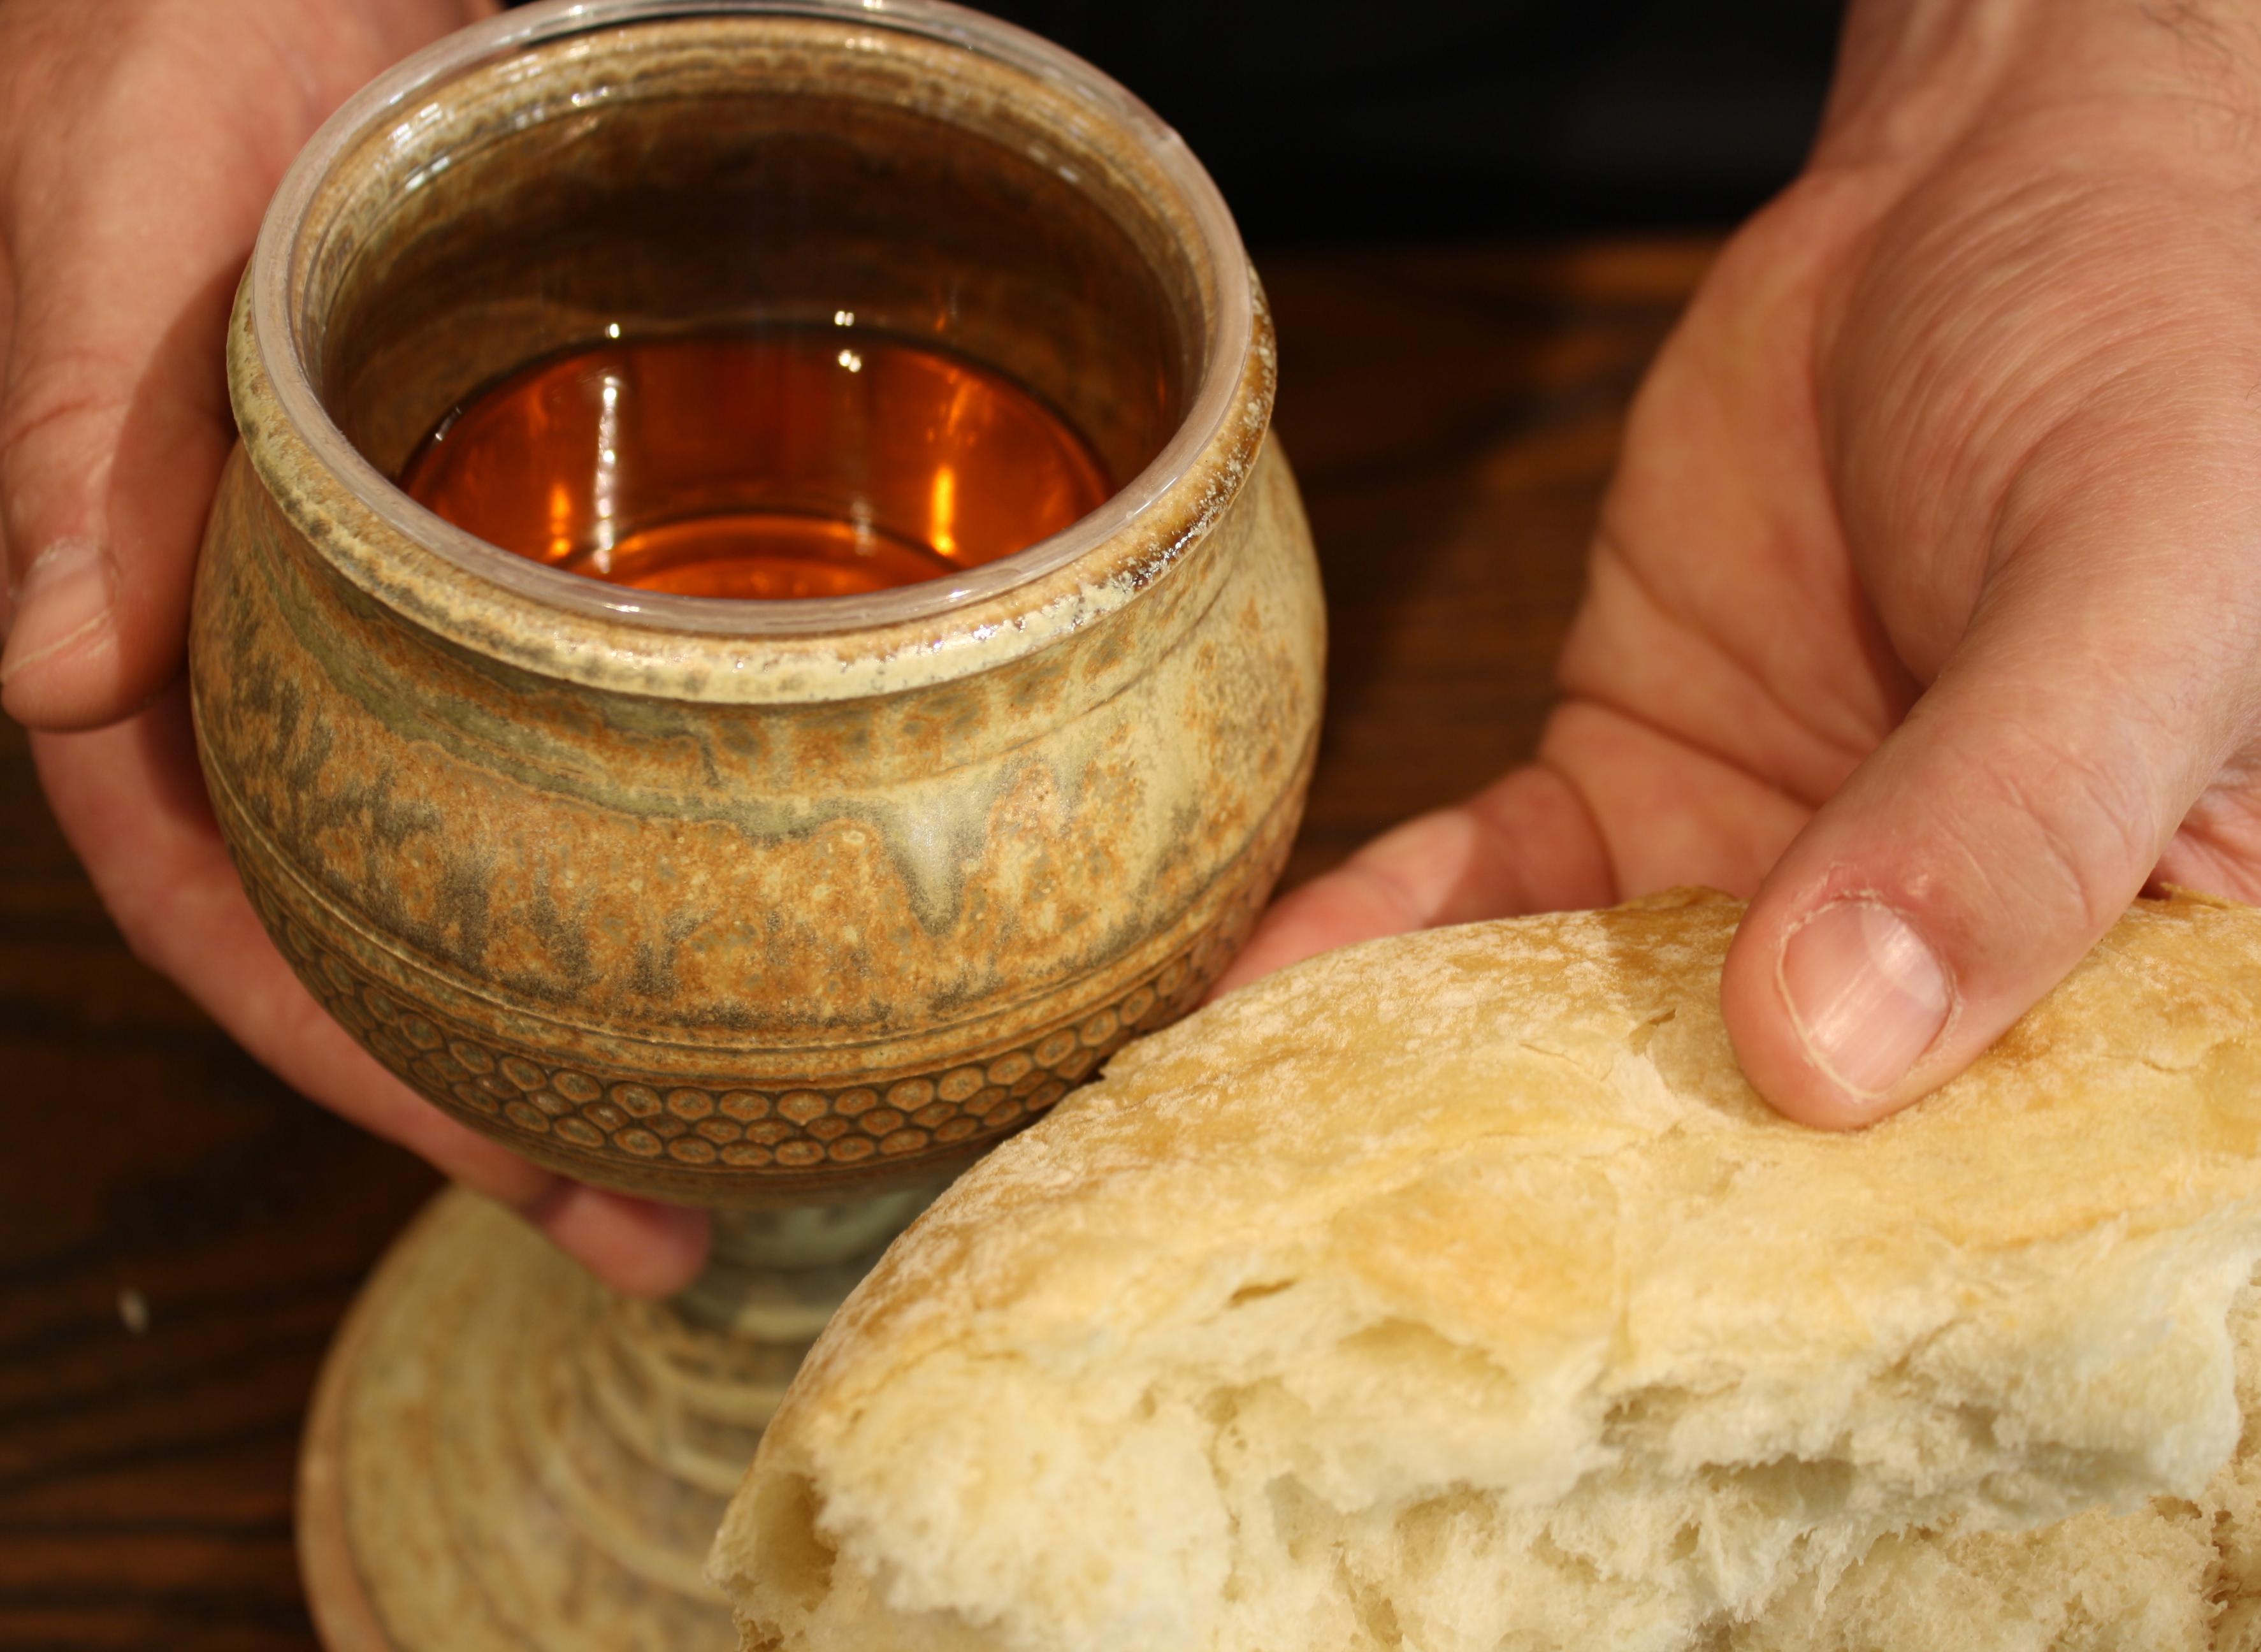 vin, bread, romainblachier.fr